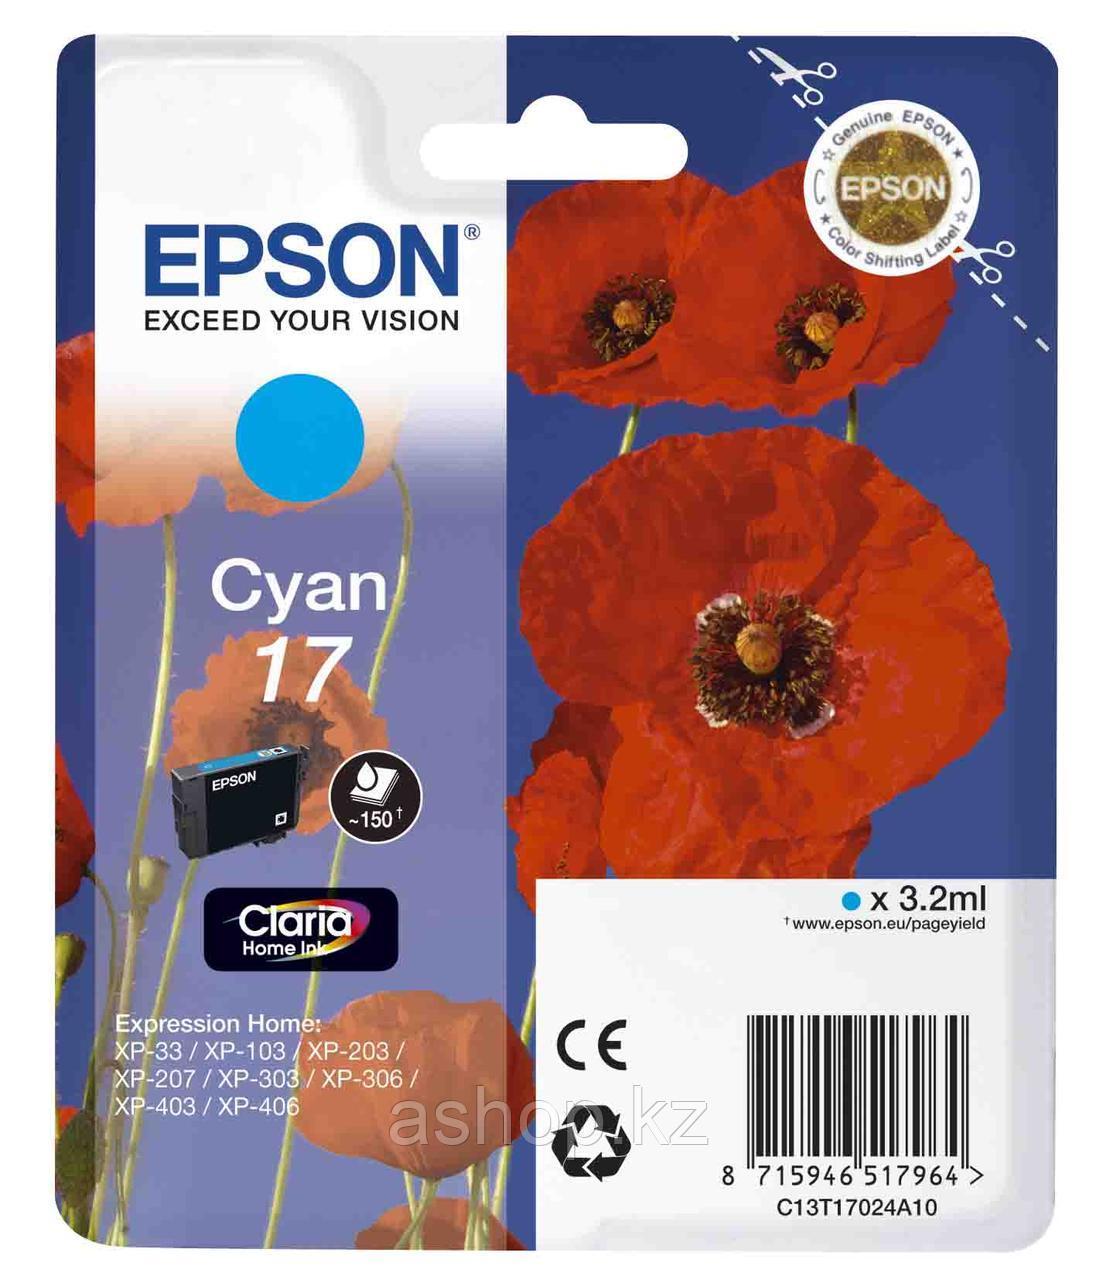 Картридж Epson C13T17024A10 (№17), Объем: 3,2 мл, Цвет: Голубой, Совместимость: XP33/103/203/207/303/306/403/4